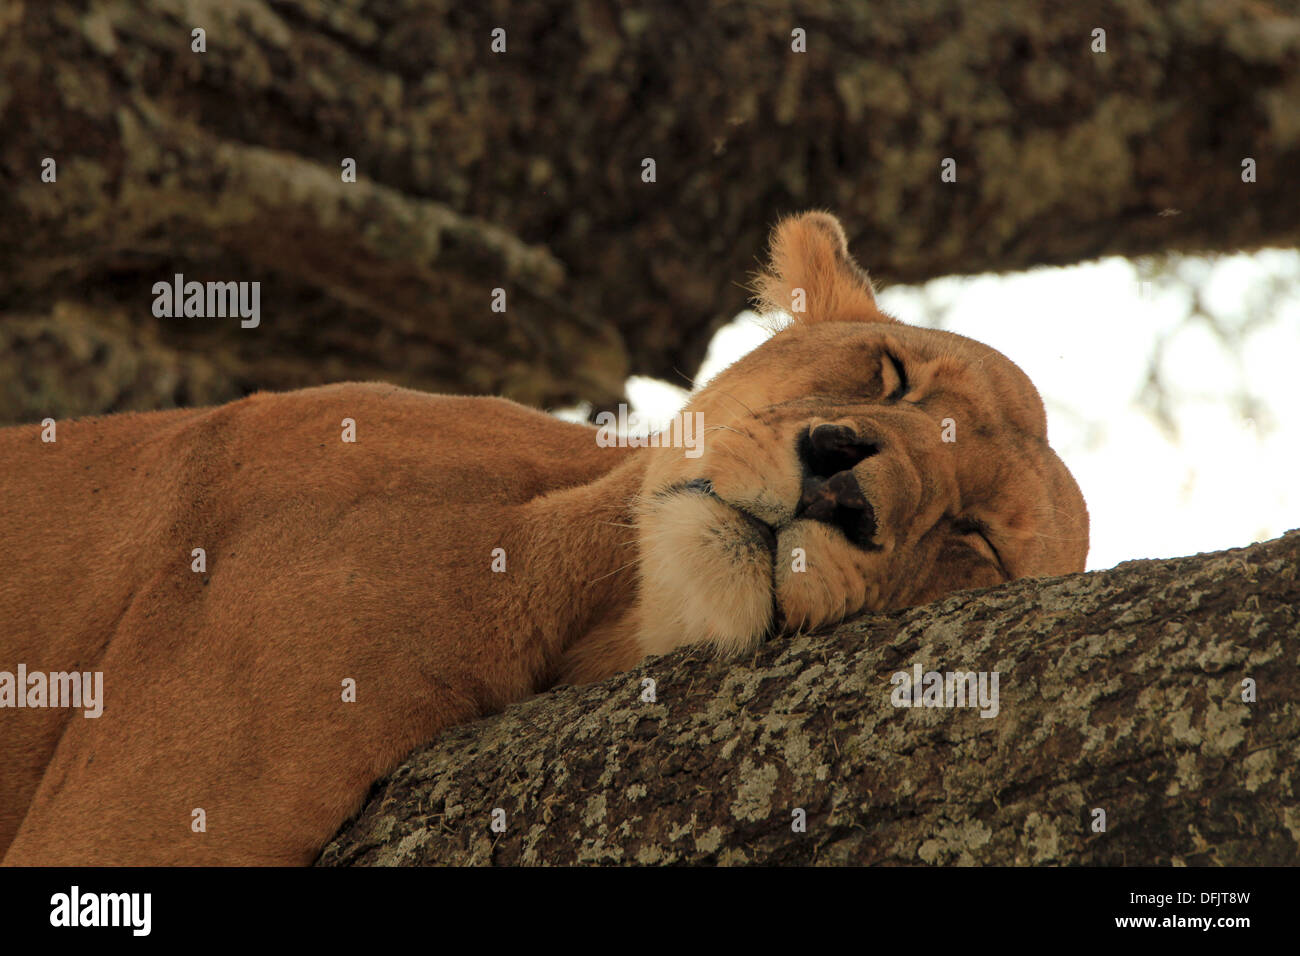 Lioness (Panthera Leo) Napping in a Tree, Serengeti, Tanzania - Stock Image